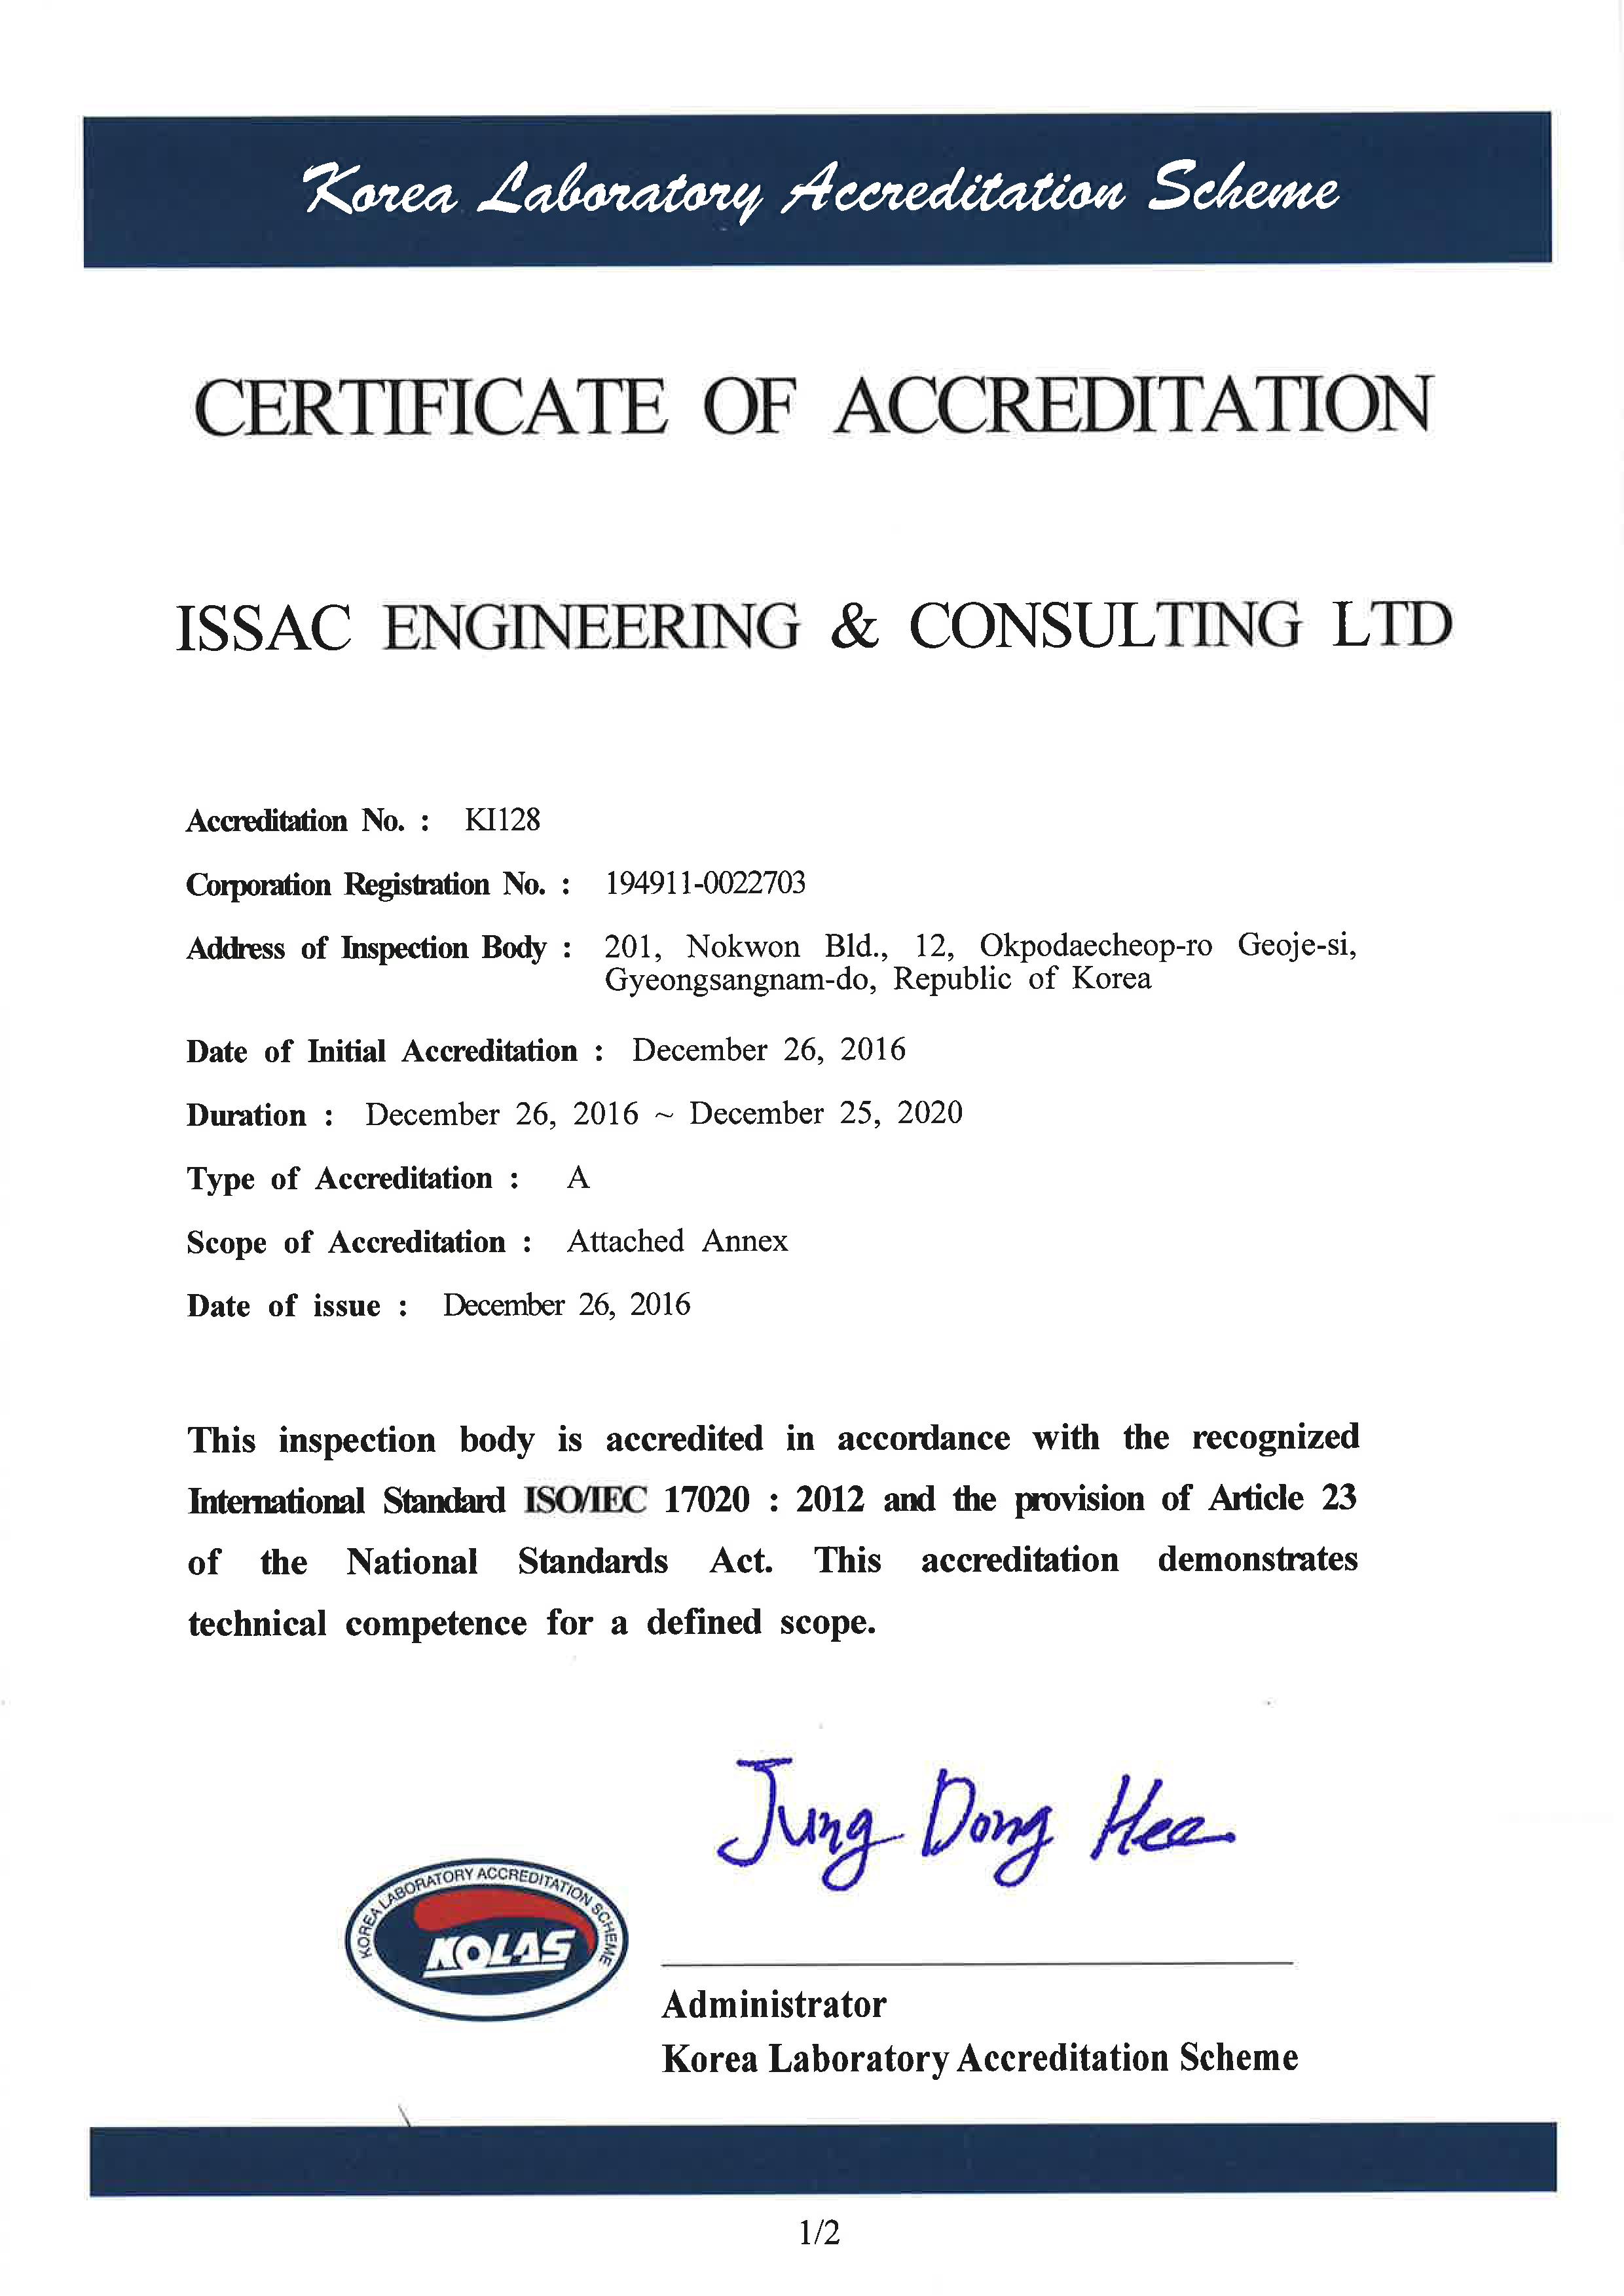 ISSAC E&C KOLAS Certificate(영문)_페이지_1.png